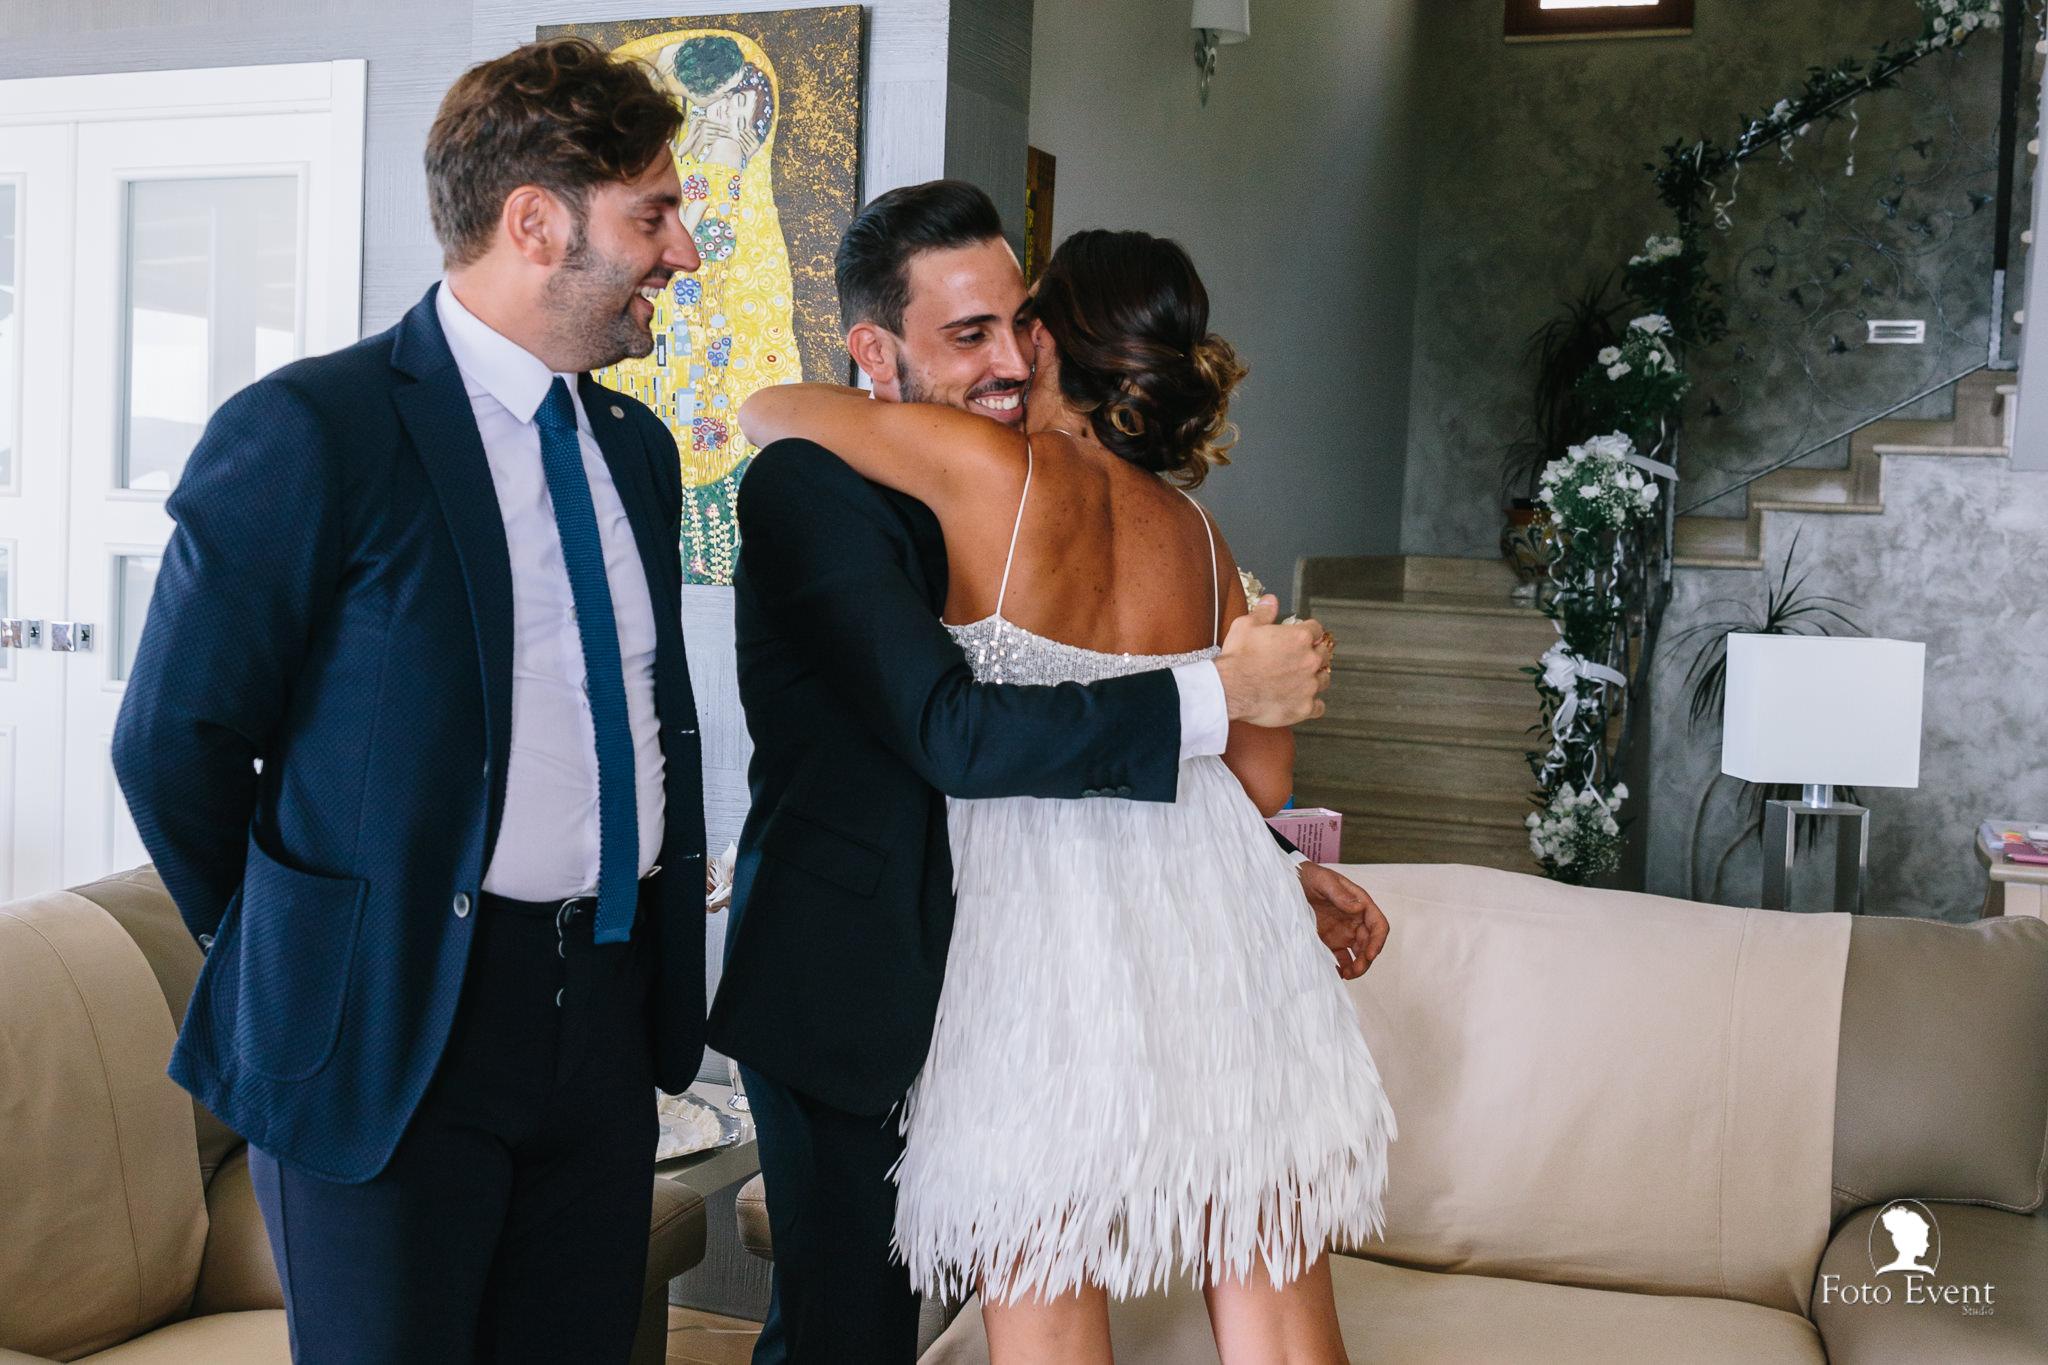 009-2019-08-31-Matrimonio-Serena-e-Saverio-Tarantino-5DE-220